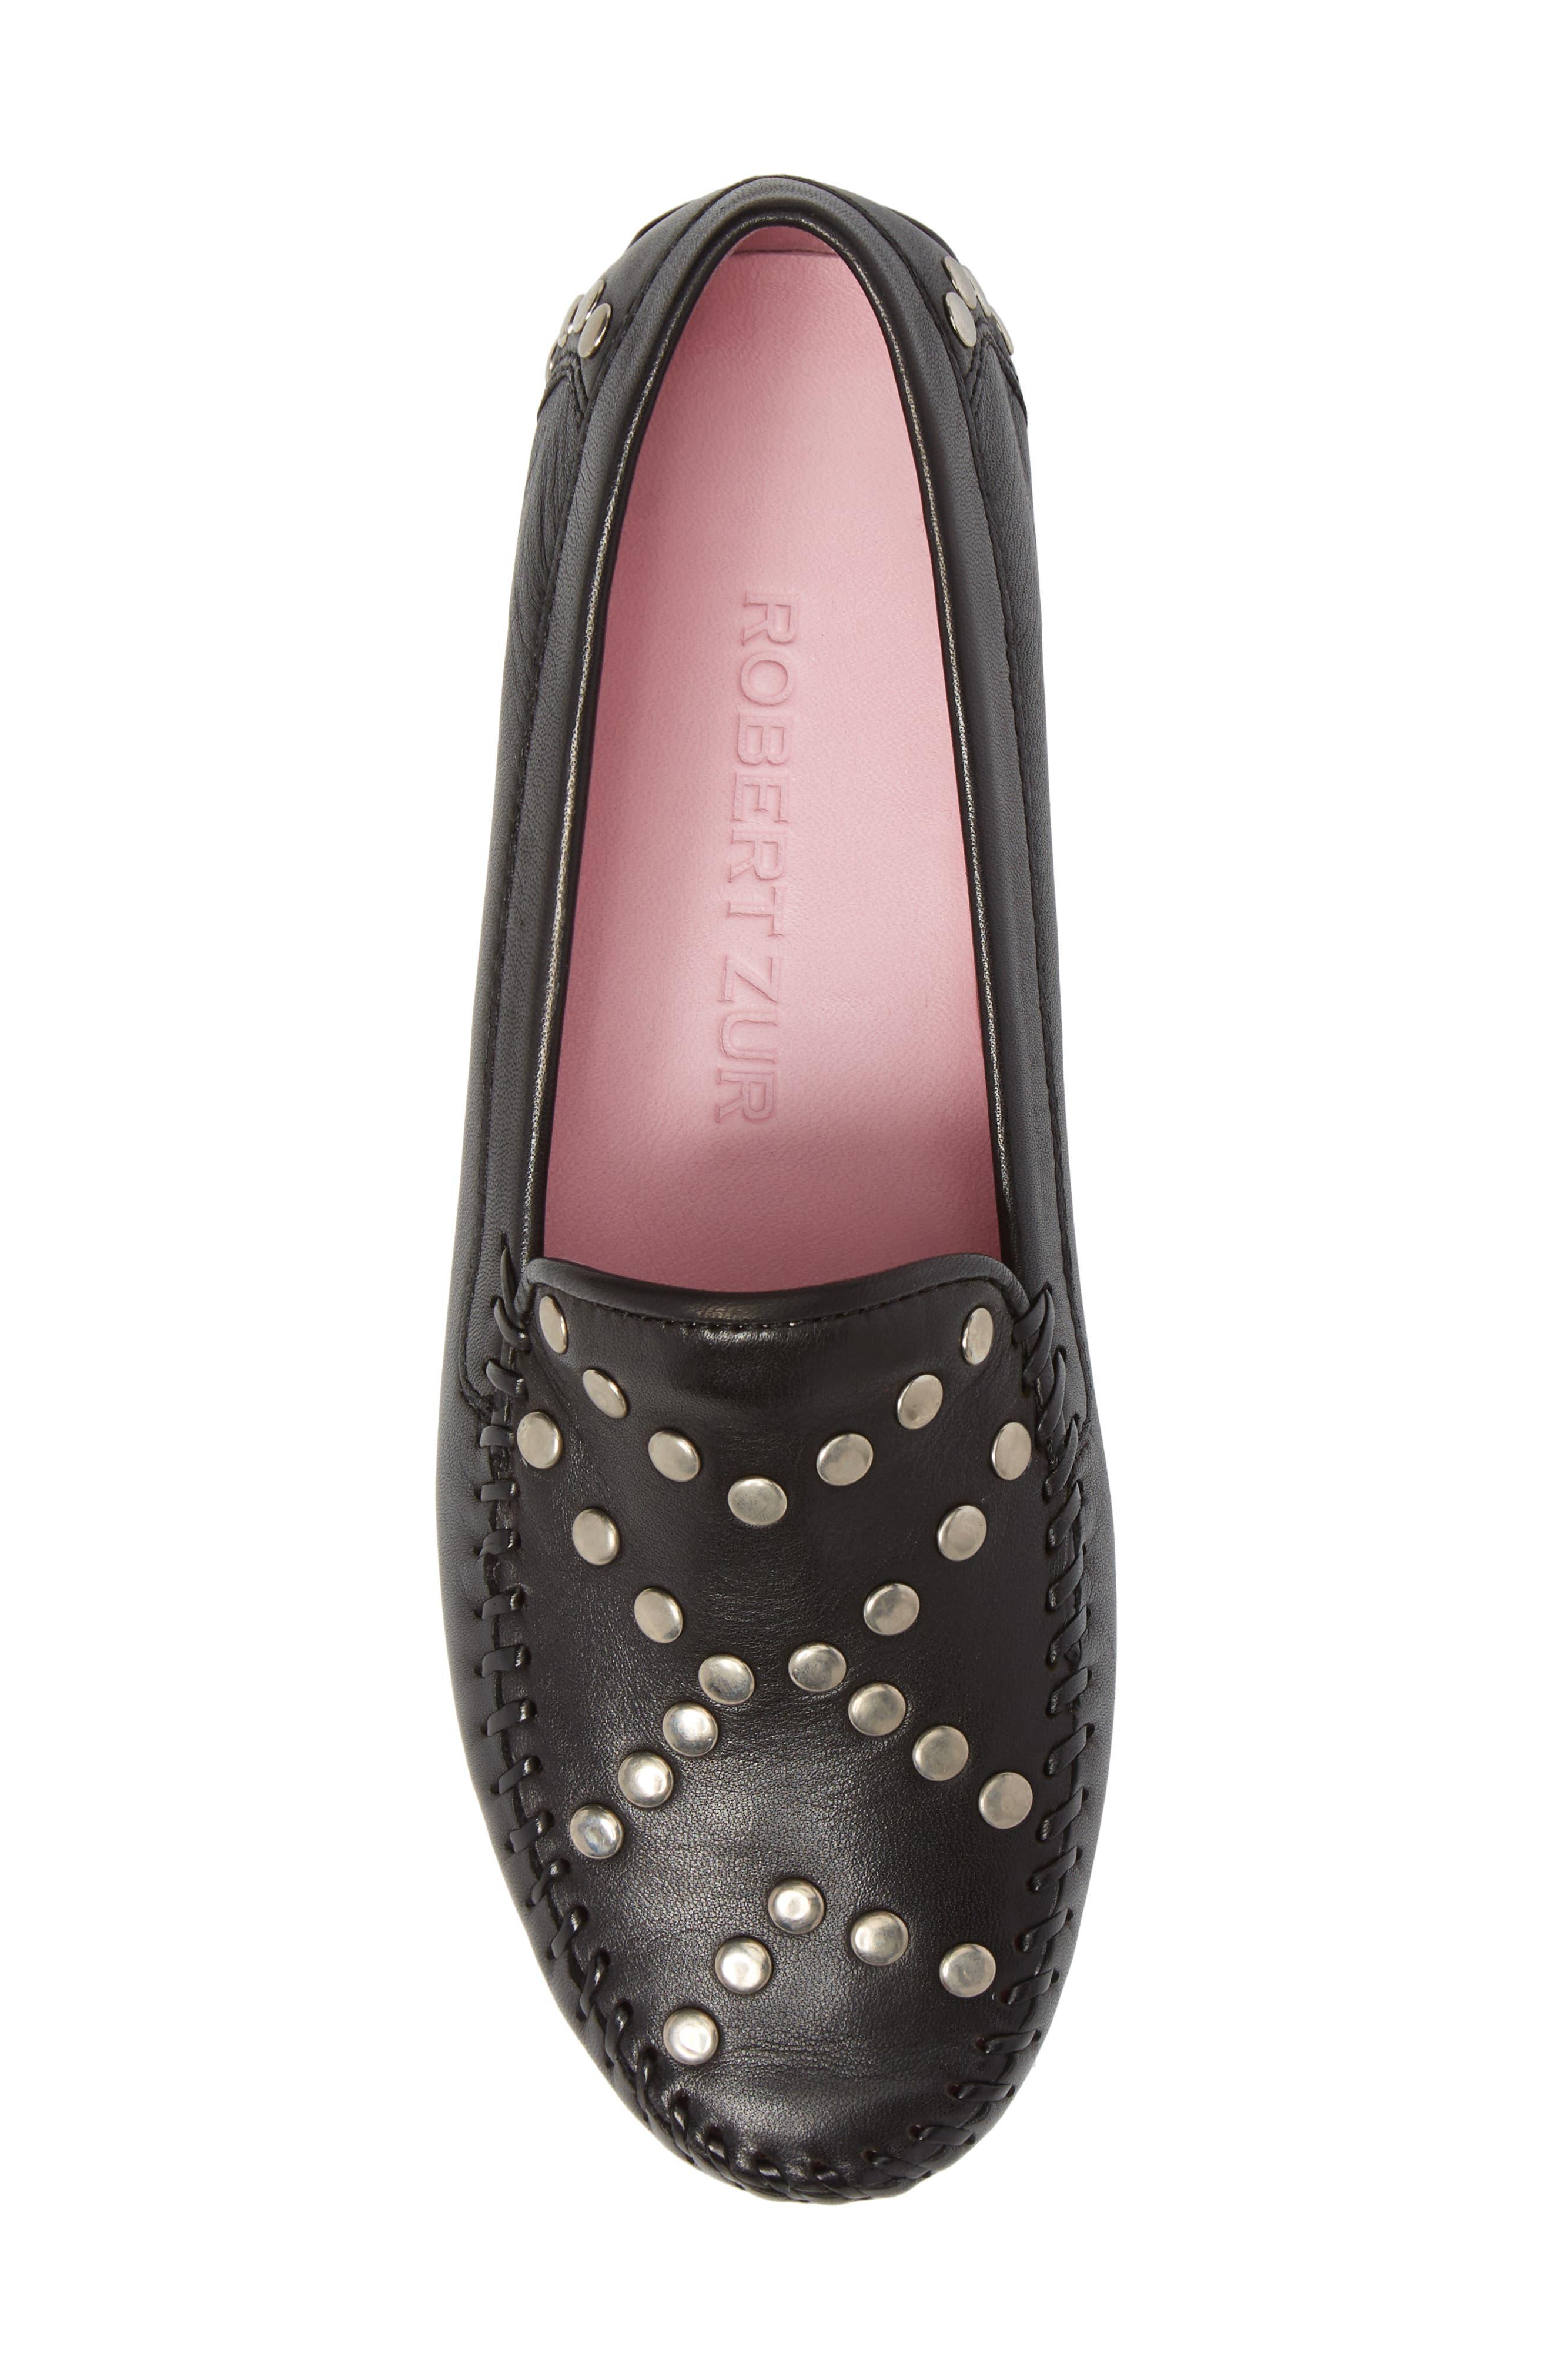 Tinae Studded Loafer,                             Alternate thumbnail 5, color,                             Black Leather